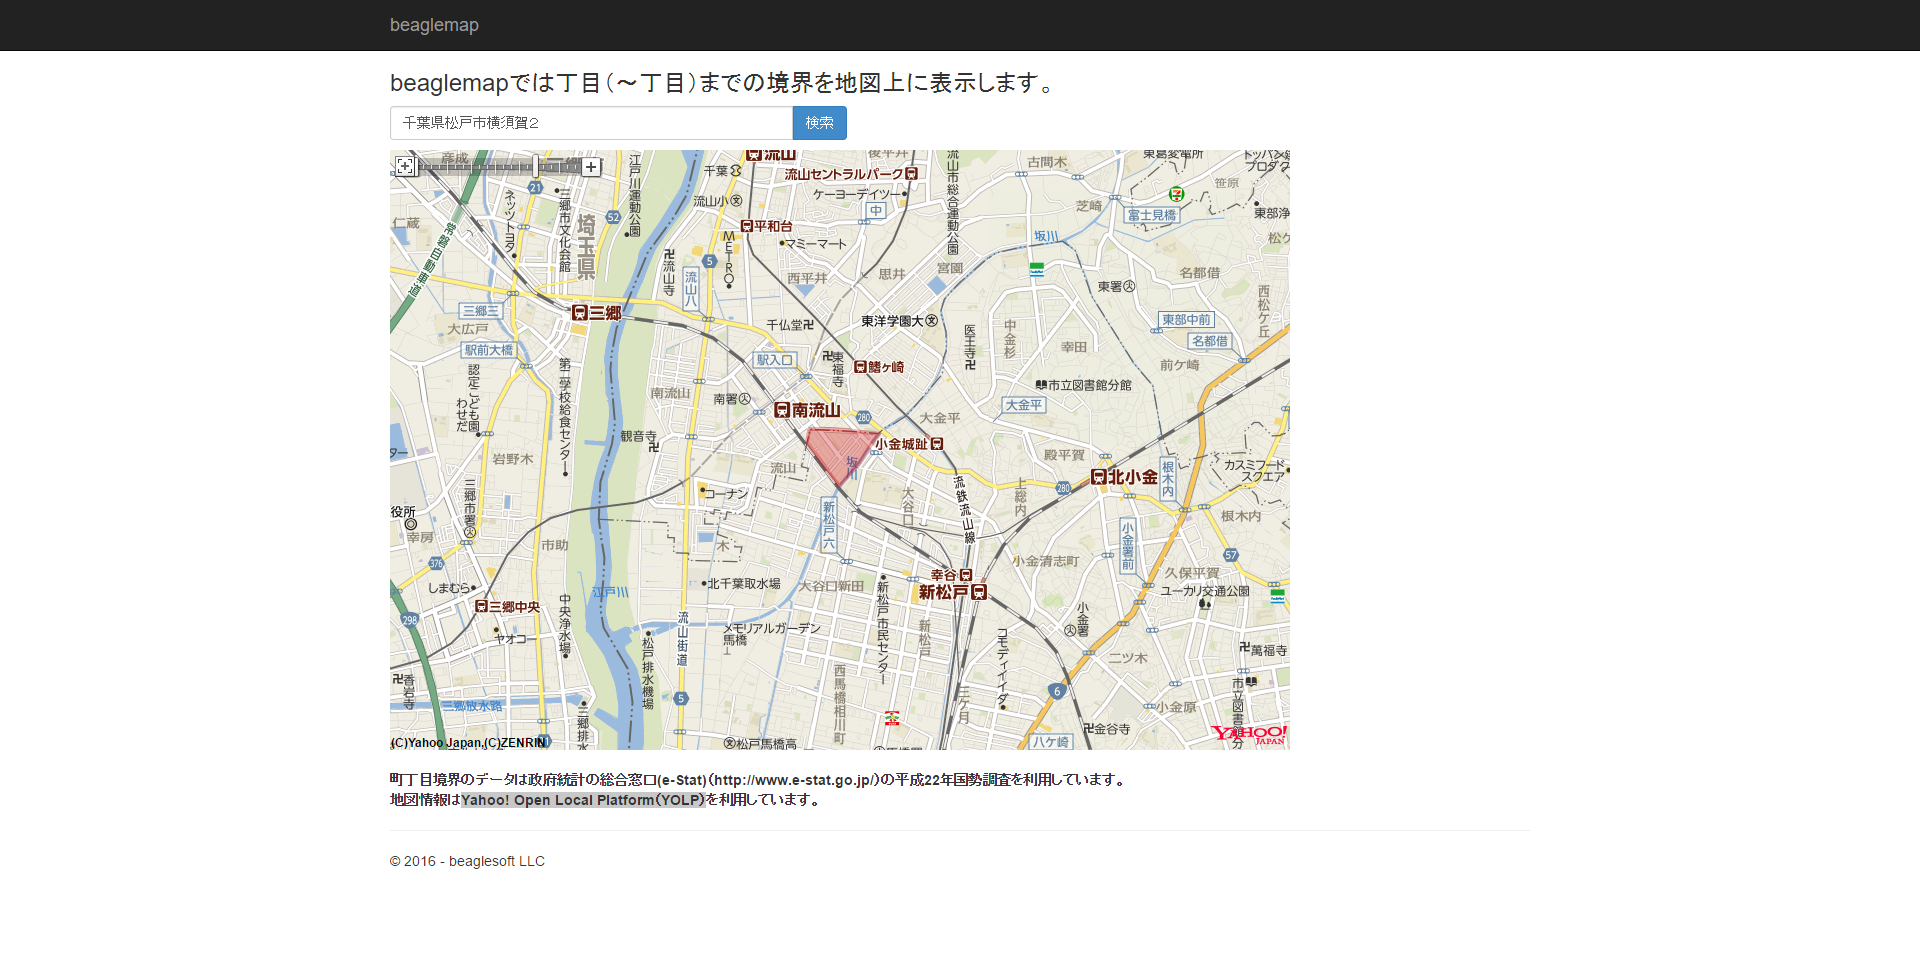 screencapture-yahoogeo20160410094759-azurewebsites-net-home-index-1460351618108.png (740.5 kB)